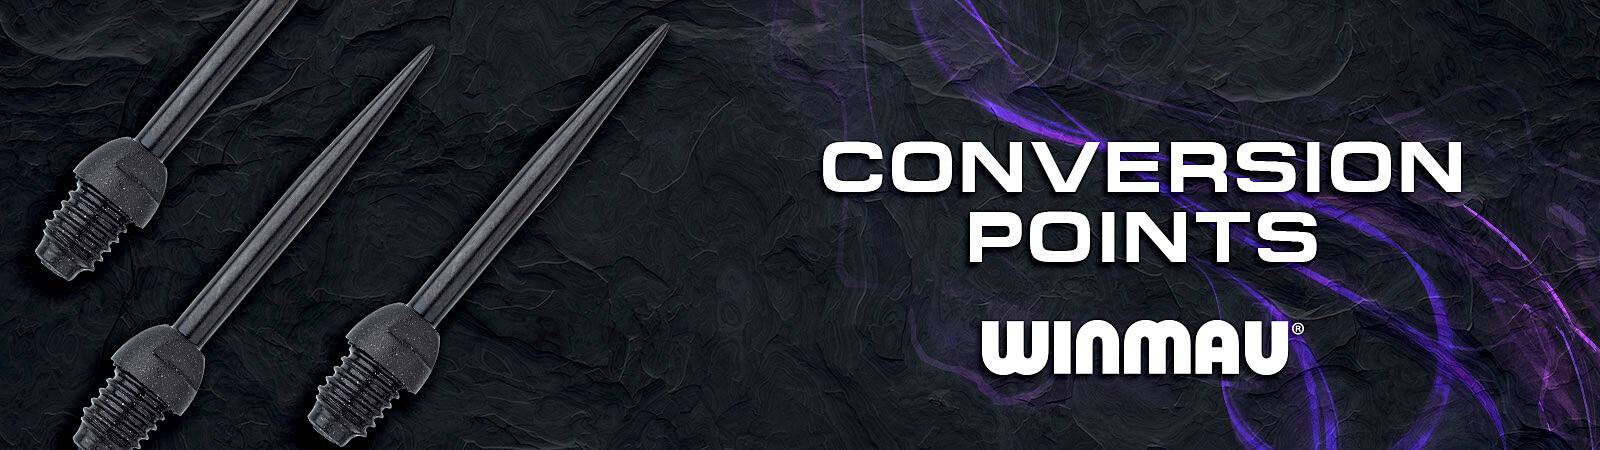 Winmau Conversion Points